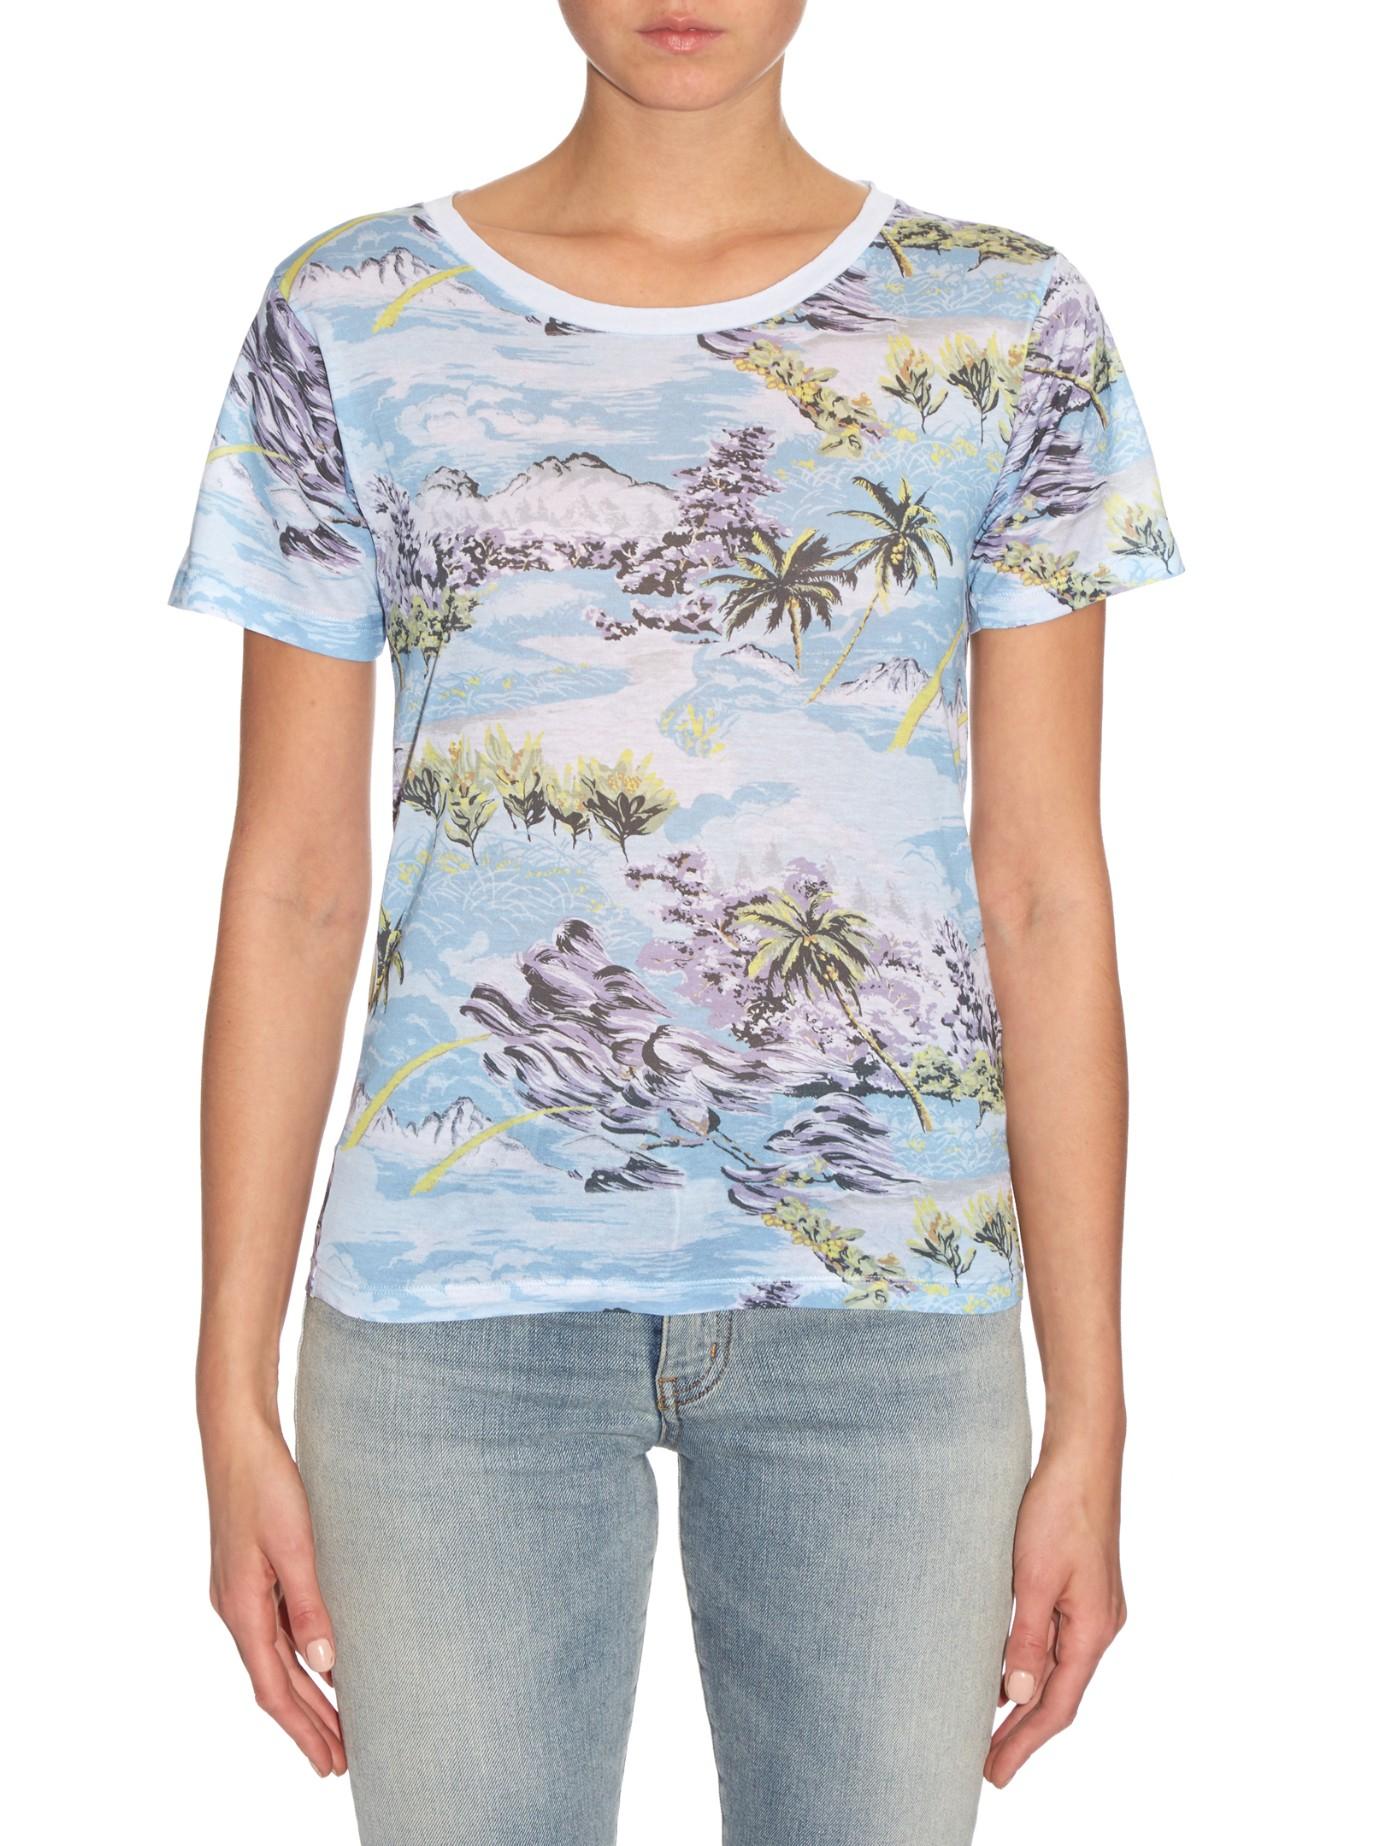 Saint laurent hawaiian print cotton jersey t shirt in blue for T shirt printing hawaii